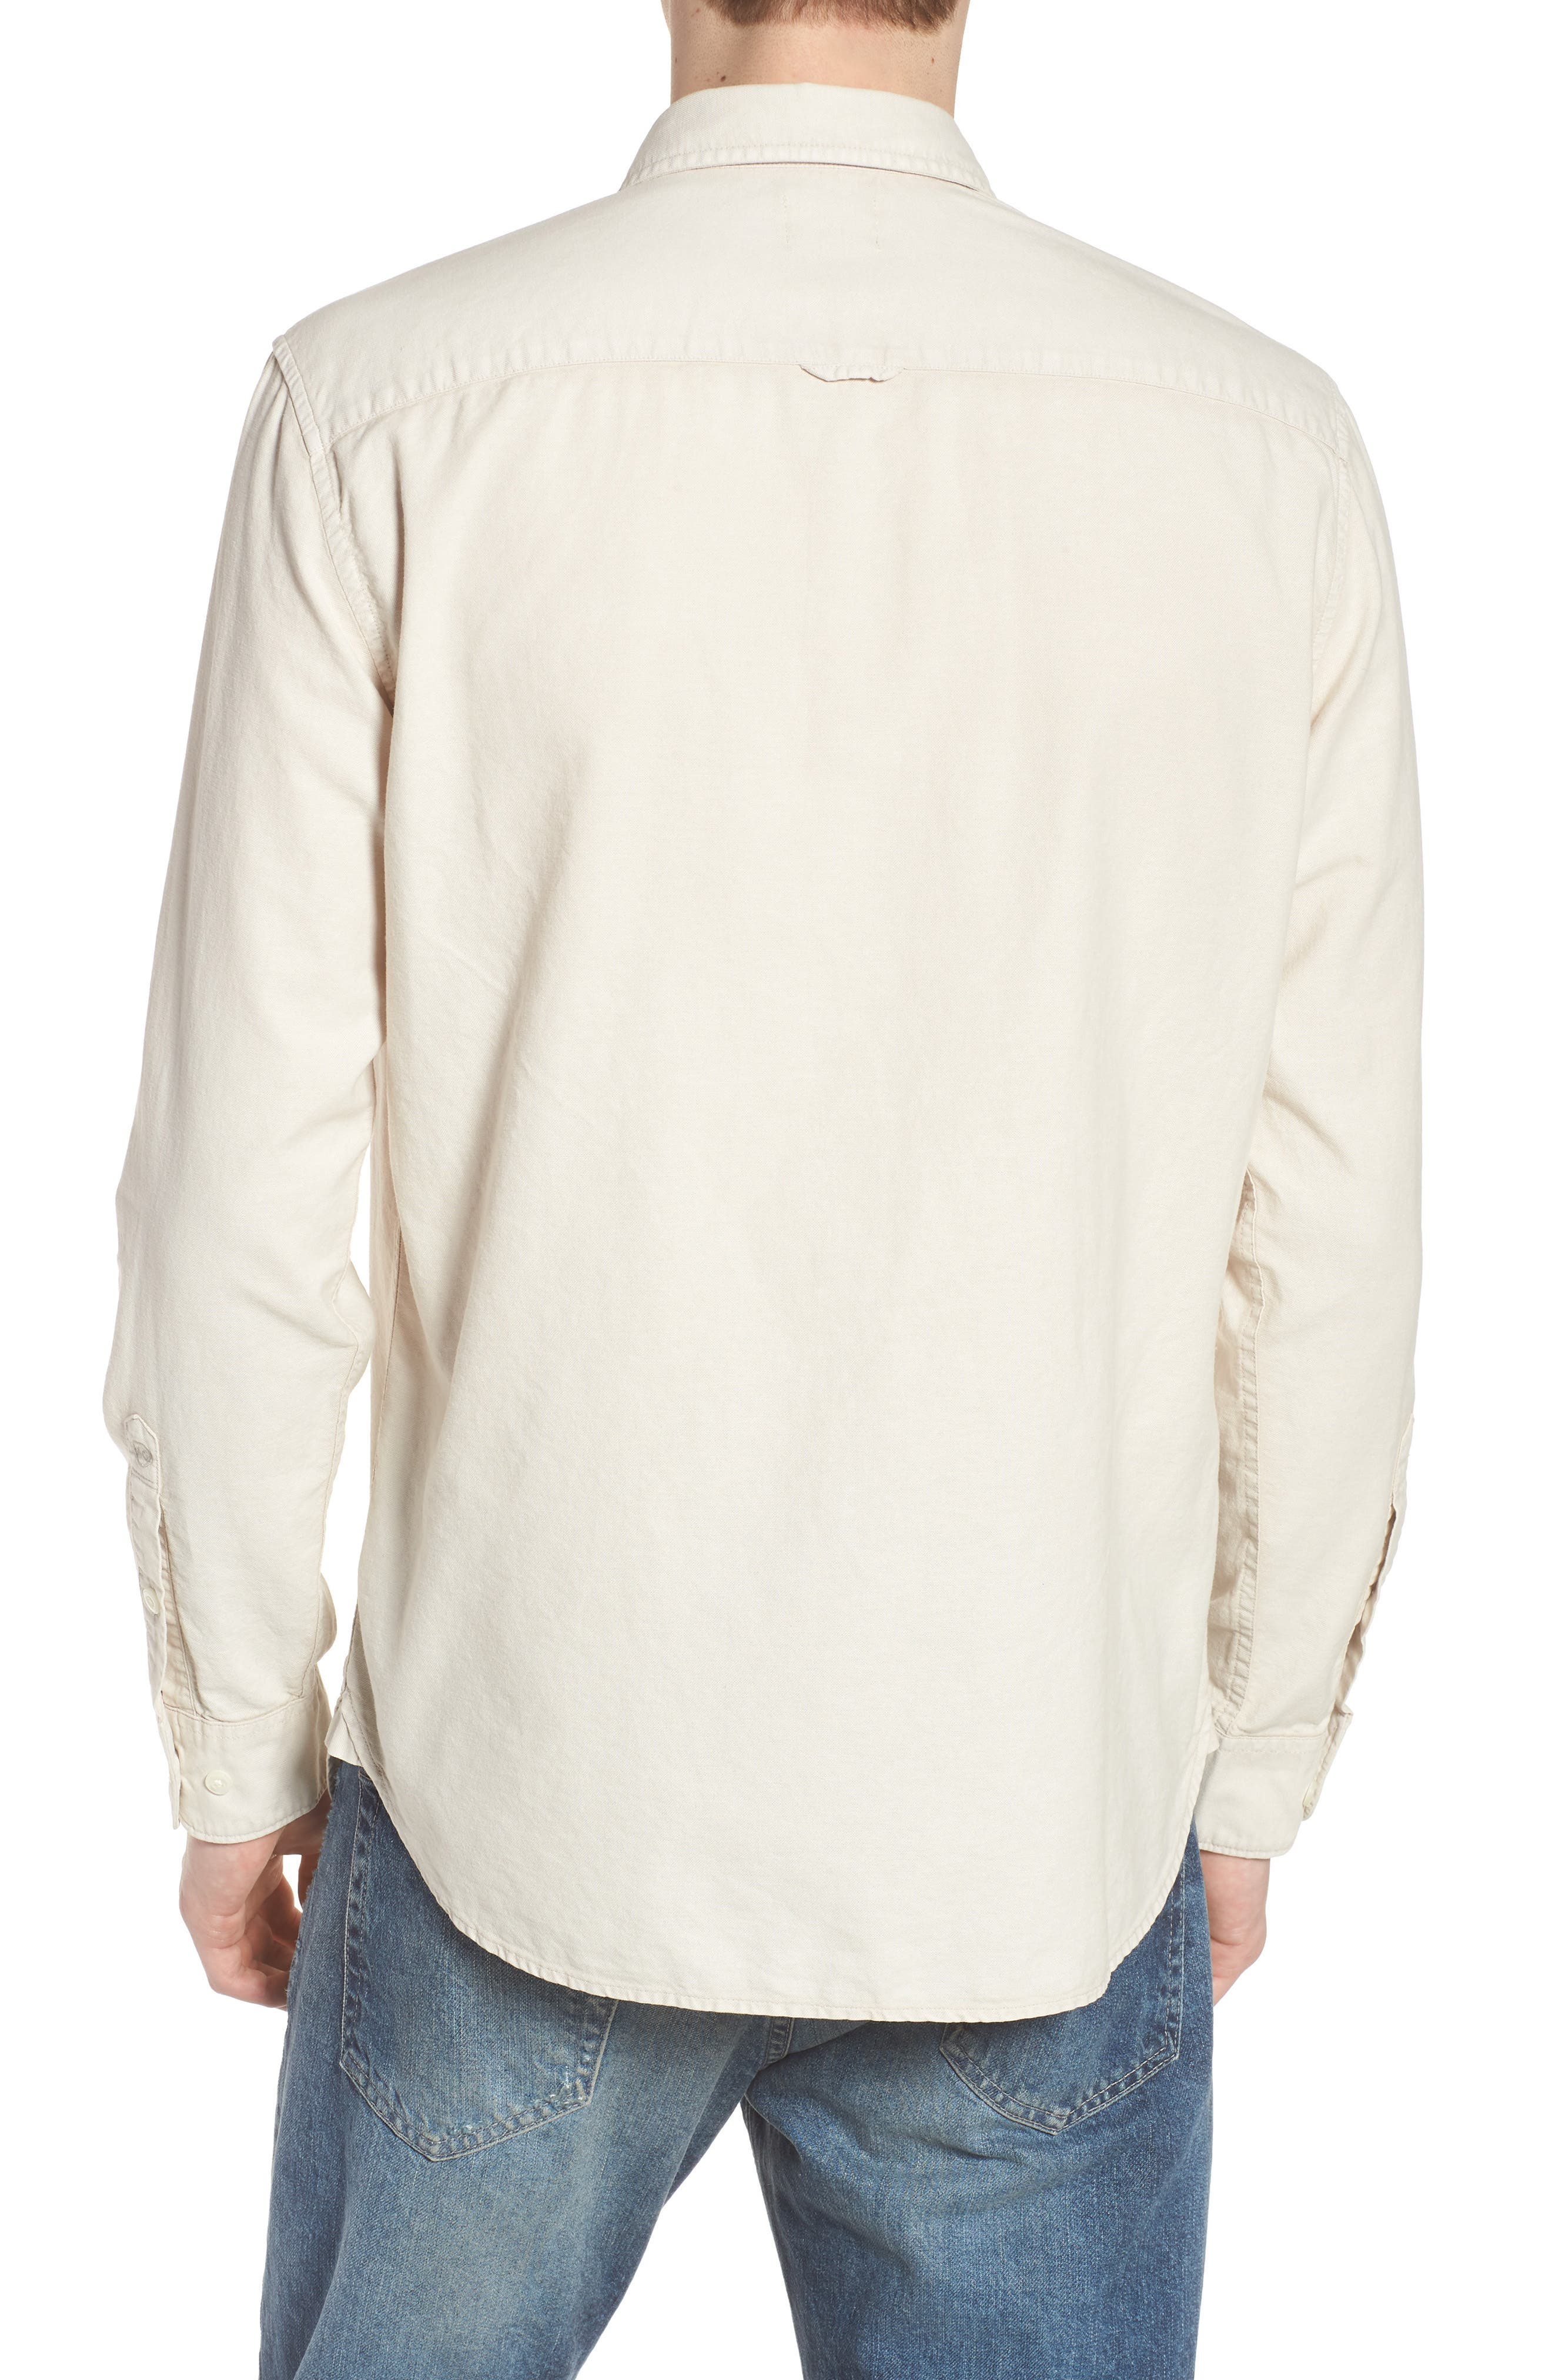 Bristol Slim Fit Sport Shirt,                             Alternate thumbnail 2, color,                             Sunbaked Mineral Veil